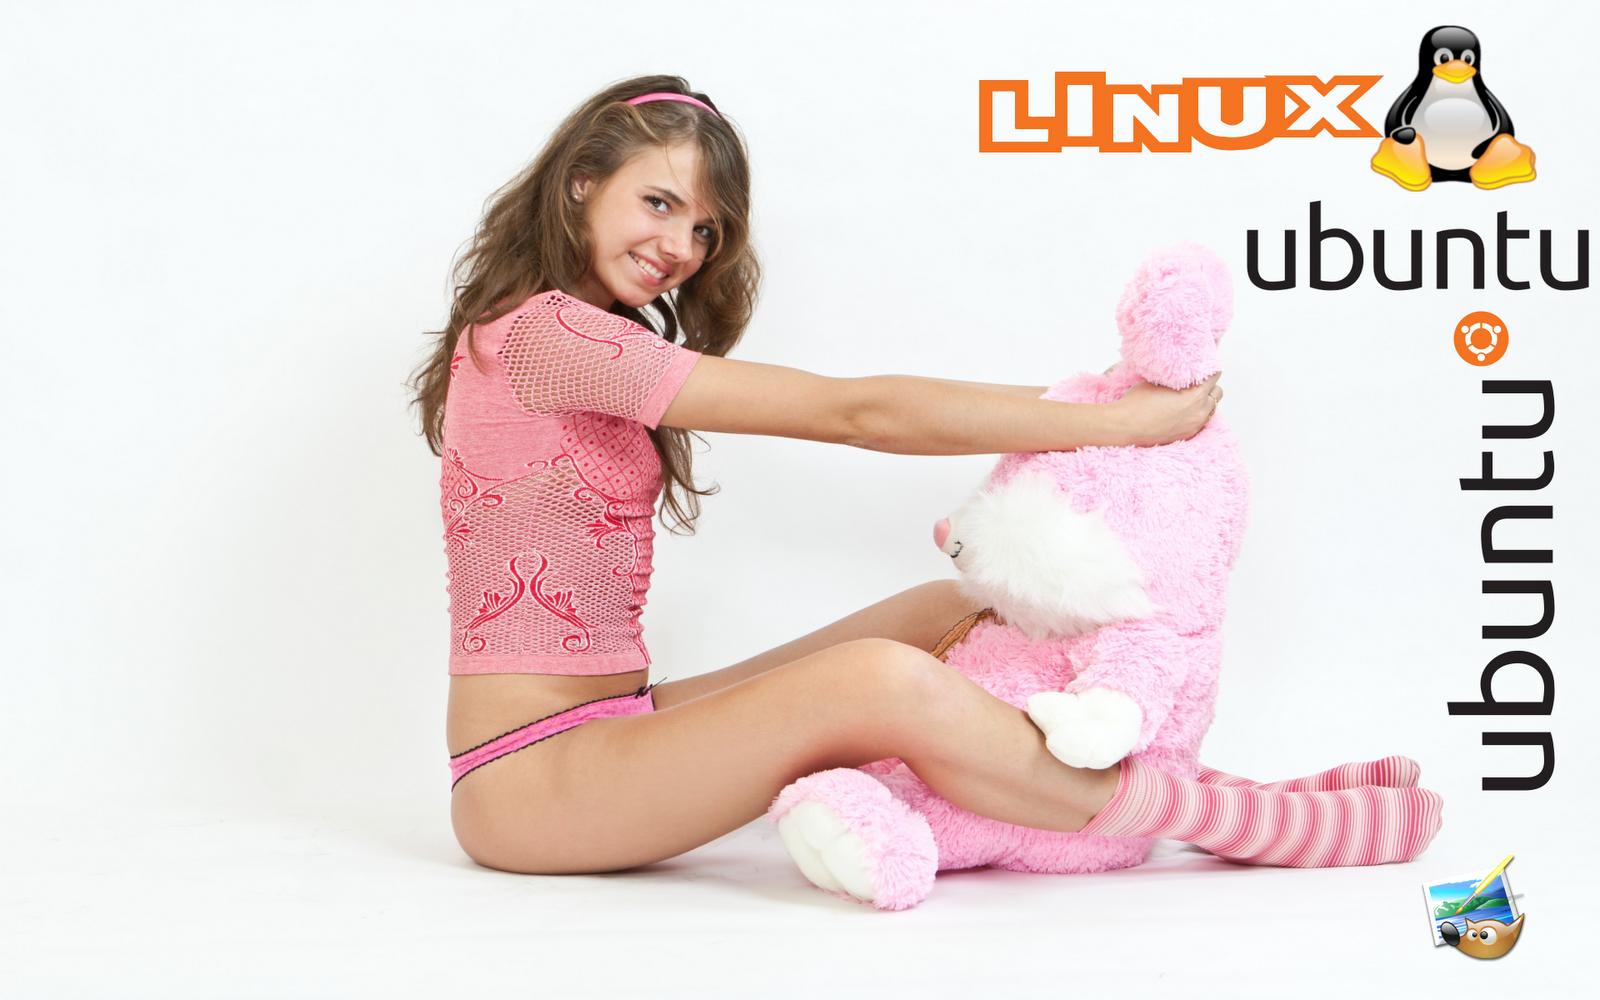 http://3.bp.blogspot.com/-K25LuTJh1ts/TkddvJI6_0I/AAAAAAAAA5E/LZPNUlFmoiM/s1600/Sandra+Model+papel+de+parede-Ubuntu-Gimp-Linux%2522%255B1920x1200%255D%2522-0001.png